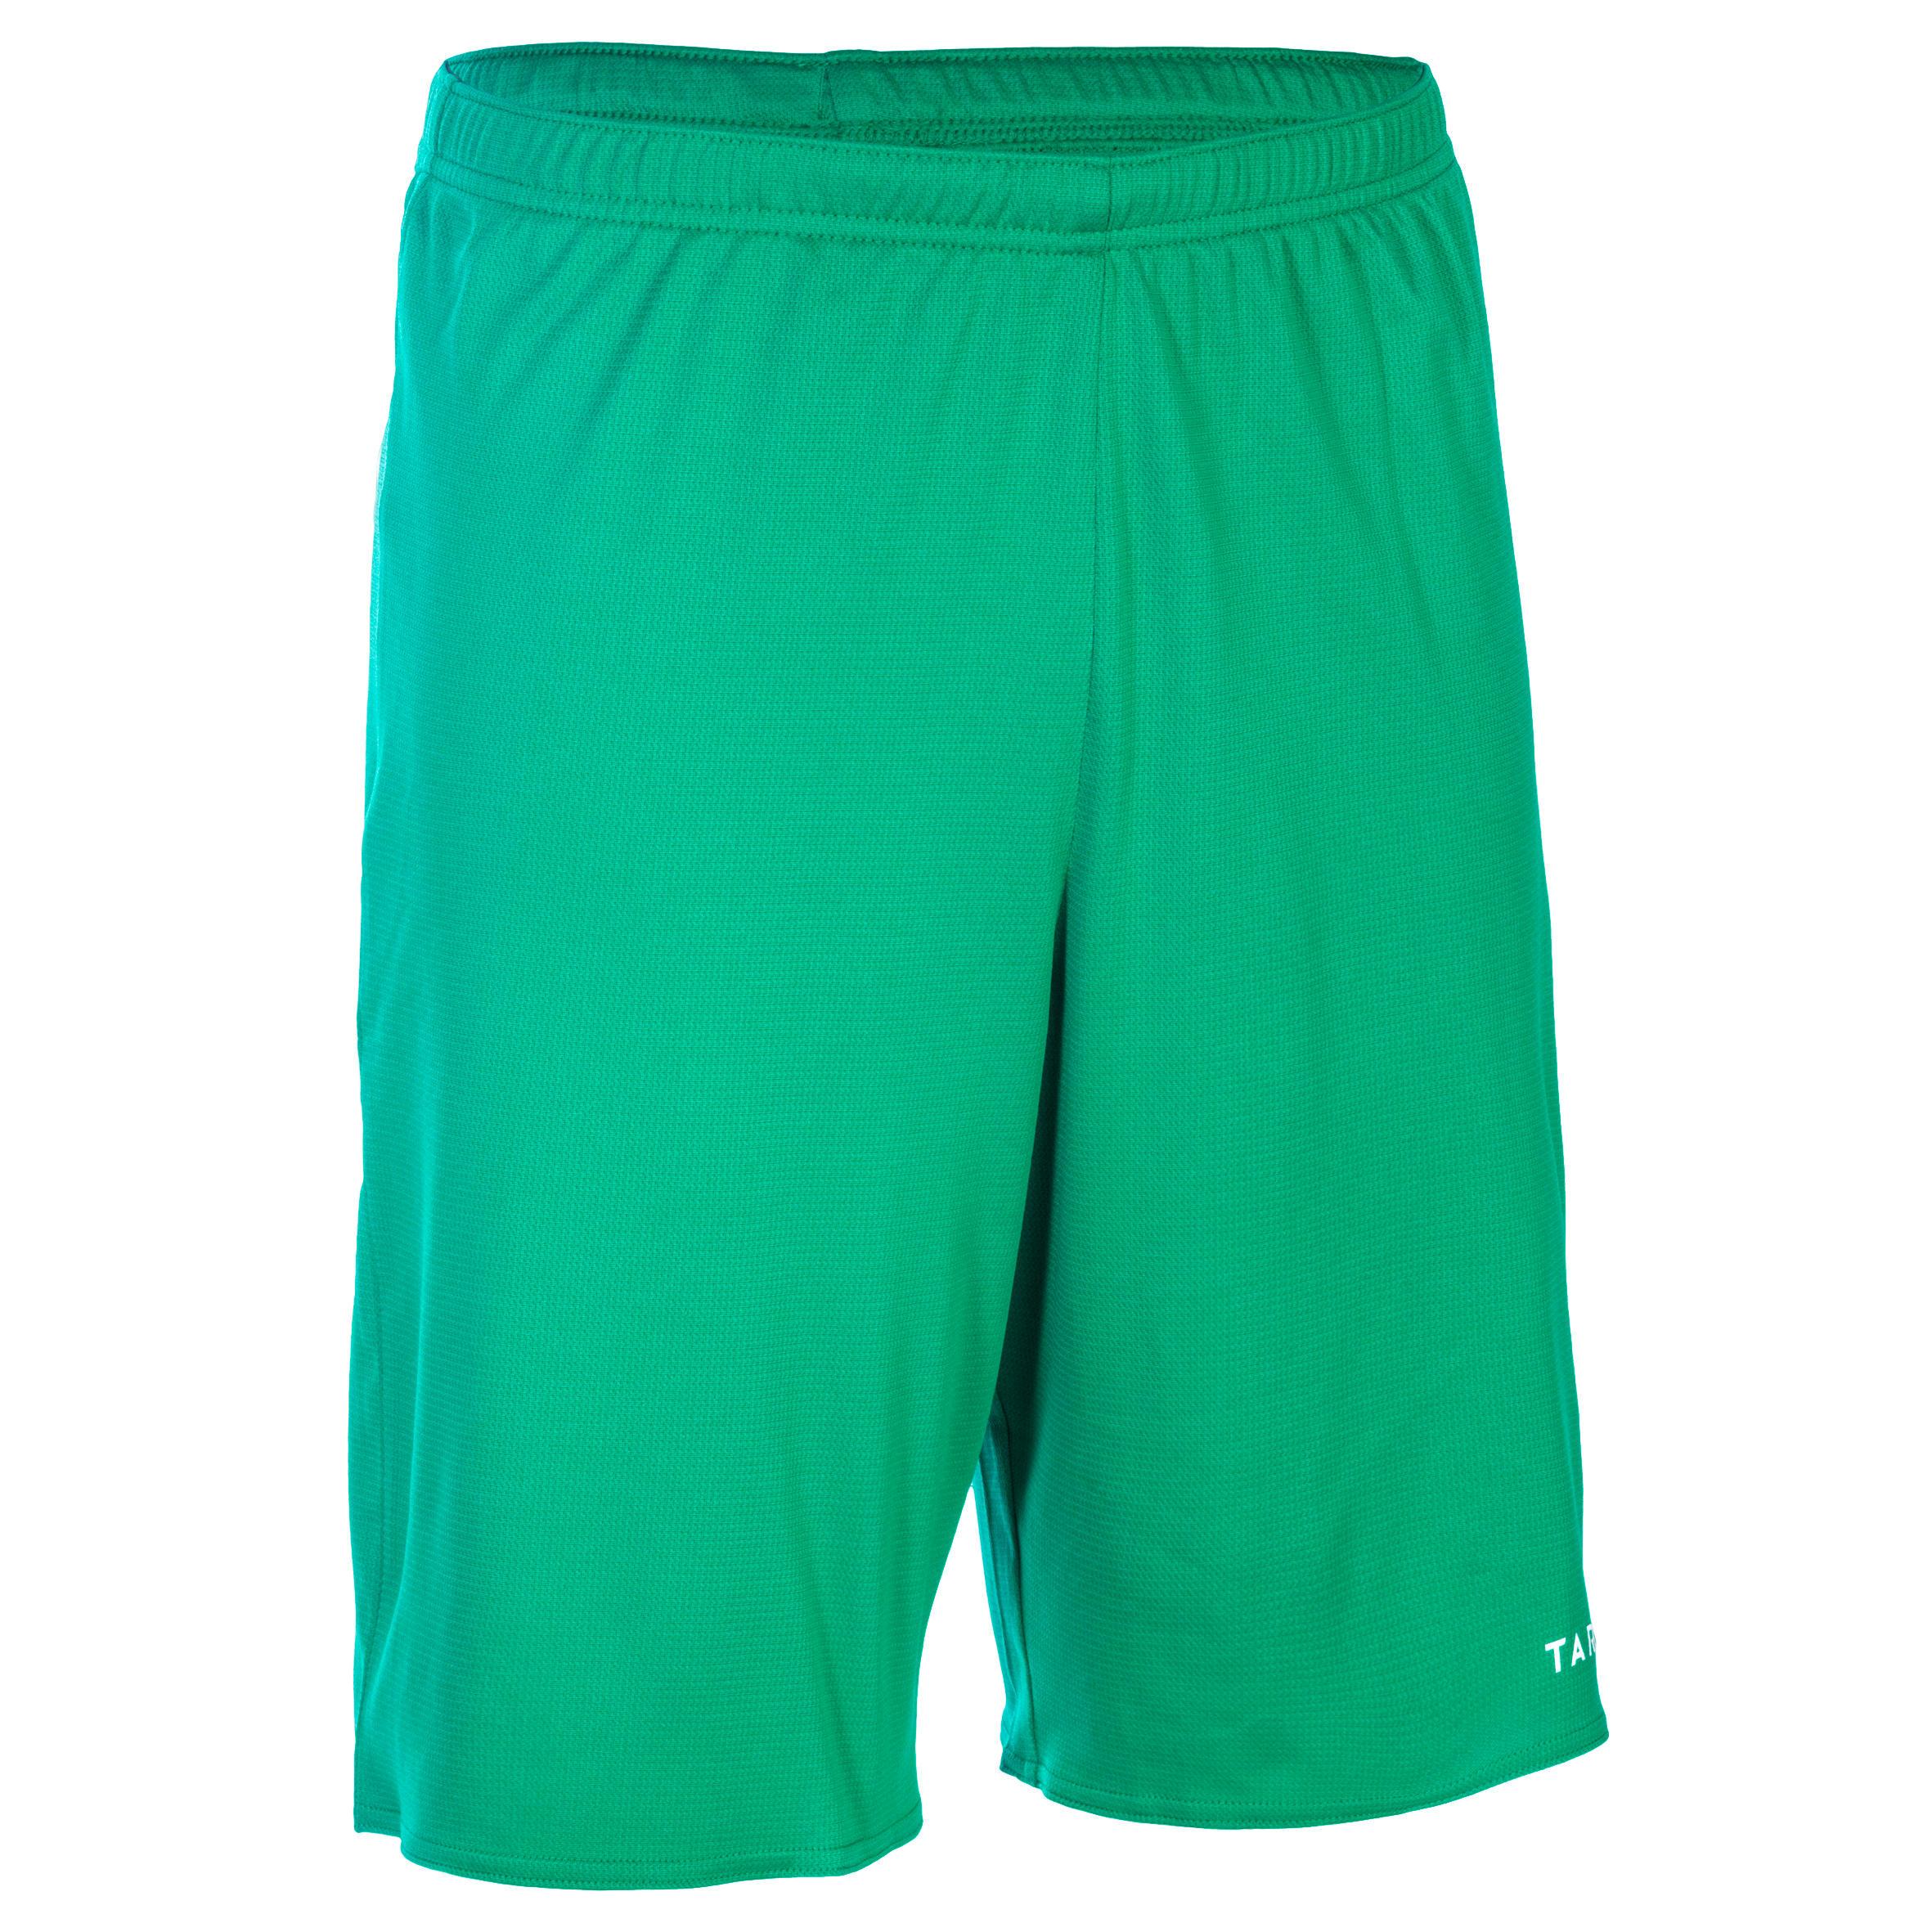 Basketballshorts SH100 Erwachsene grün | Sportbekleidung > Sporthosen > Basketballshorts | Grün - Weiß | Tarmak